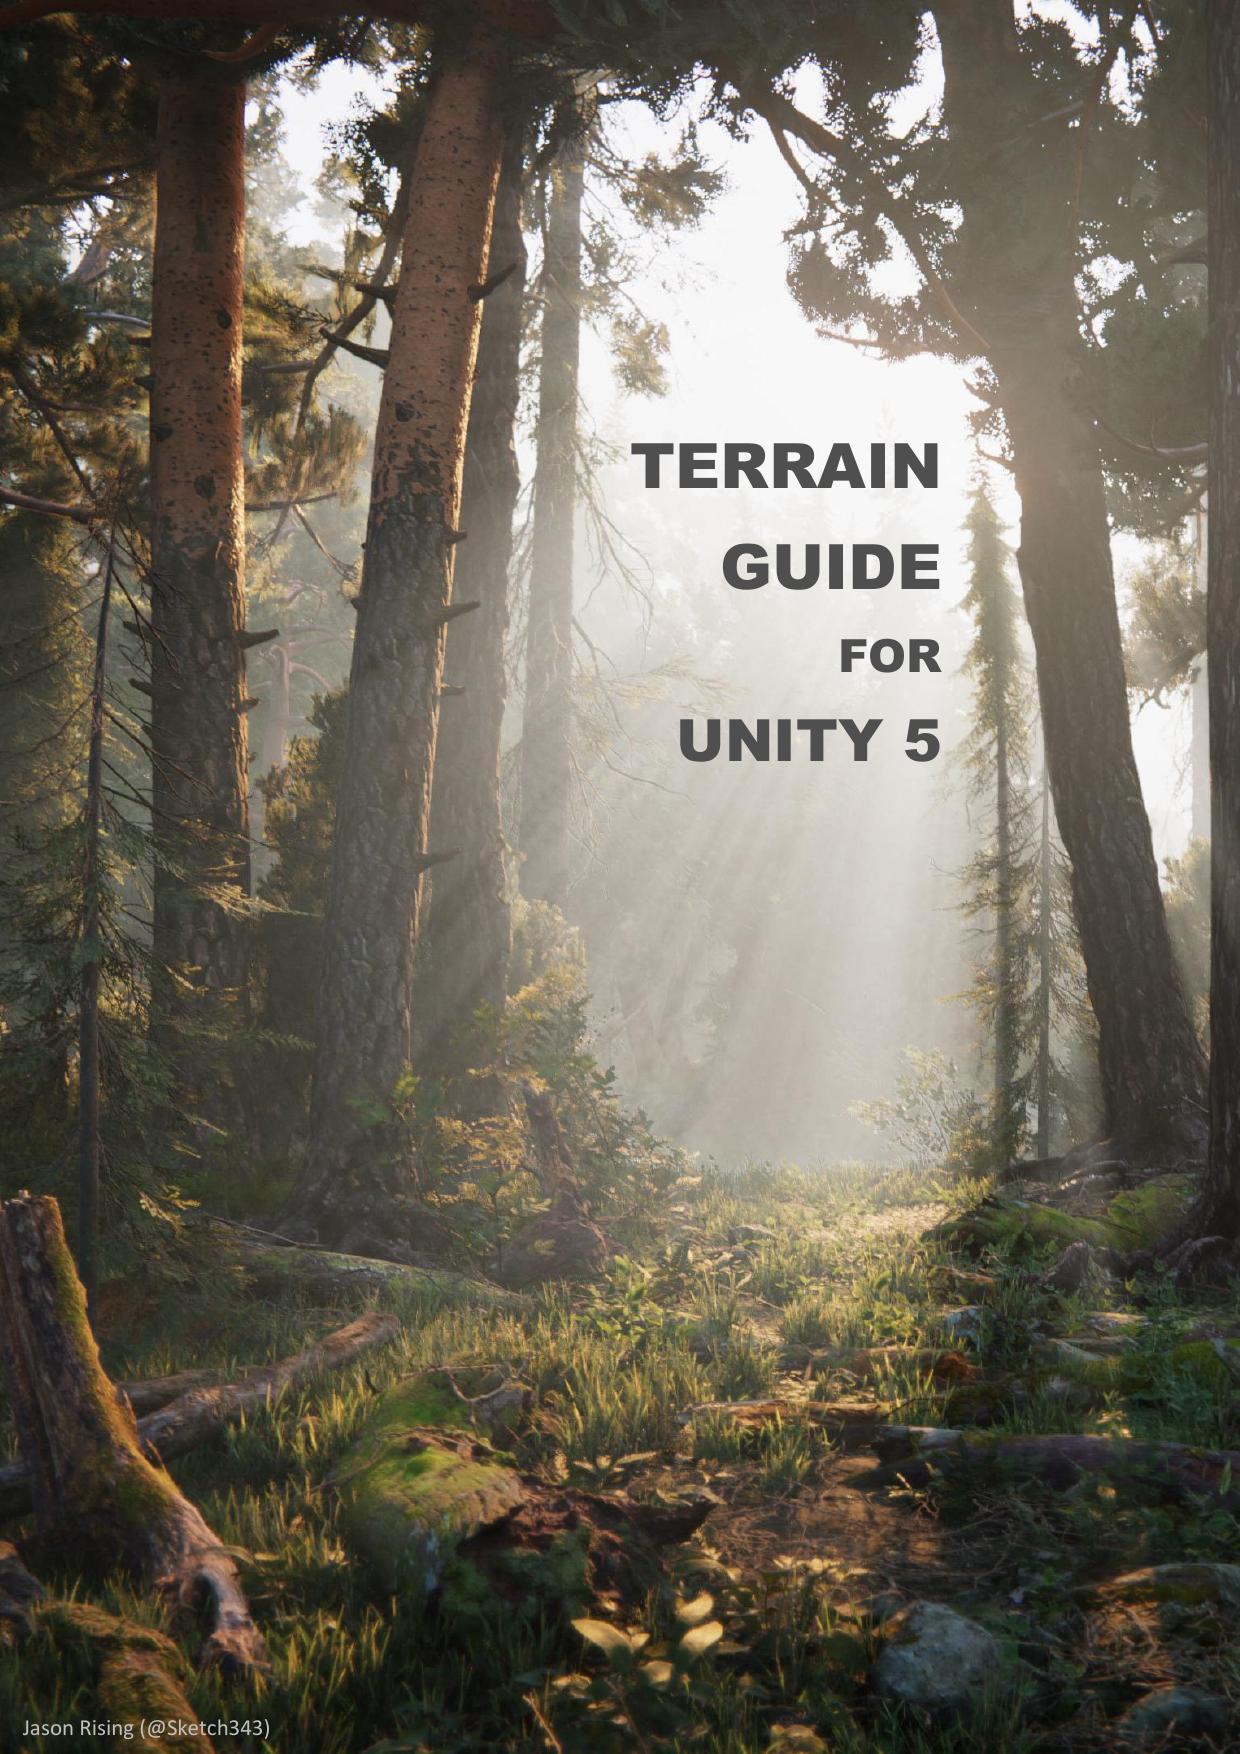 Unity 5 Terrain Guide